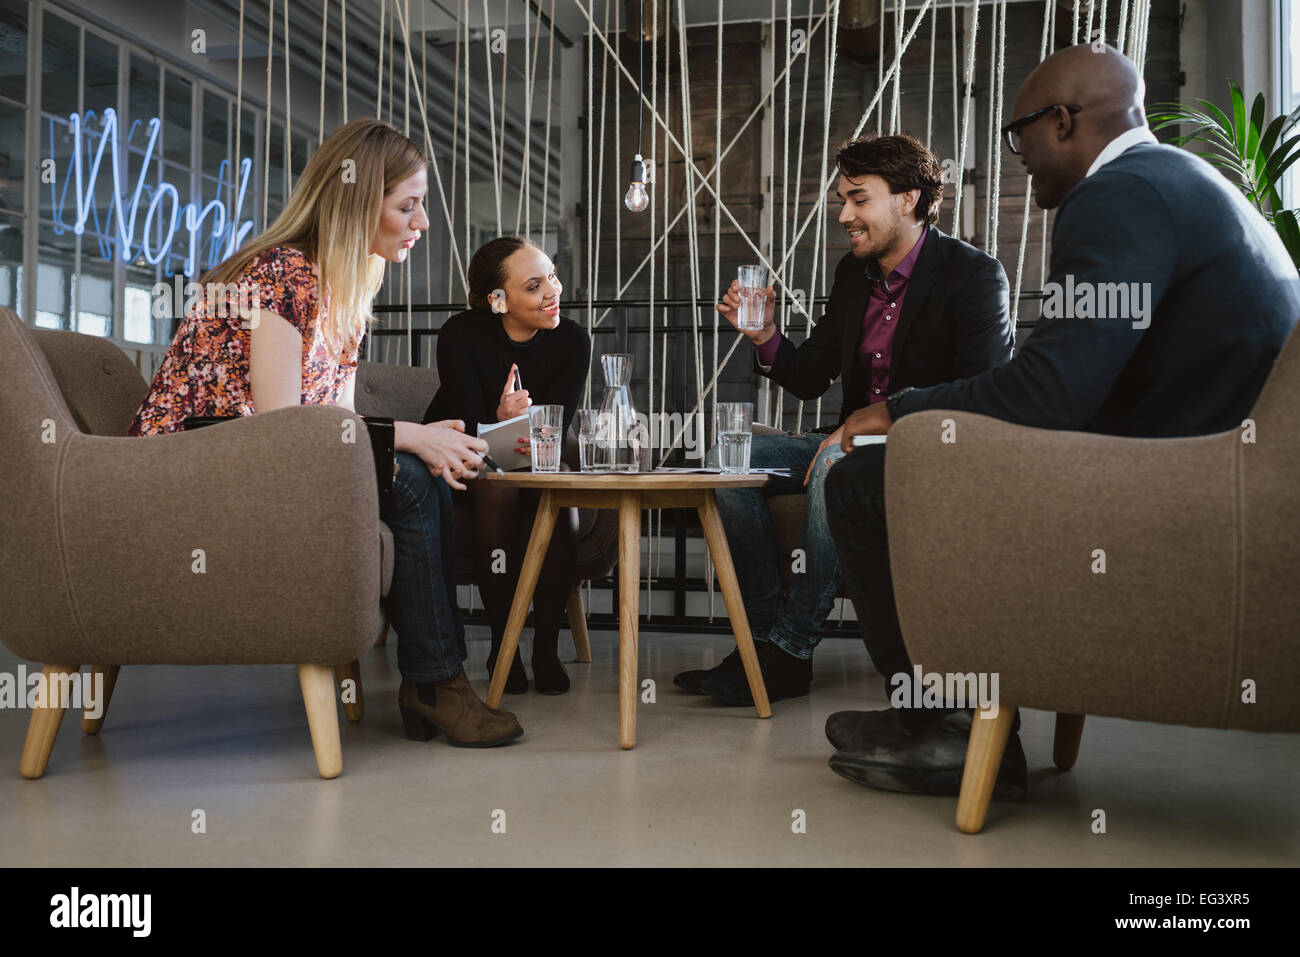 Gemischtrassig Business-Team im Büro sitzen lobby diskutieren neue Geschäftsideen. Junger Mann Trinkwasser. Stockbild